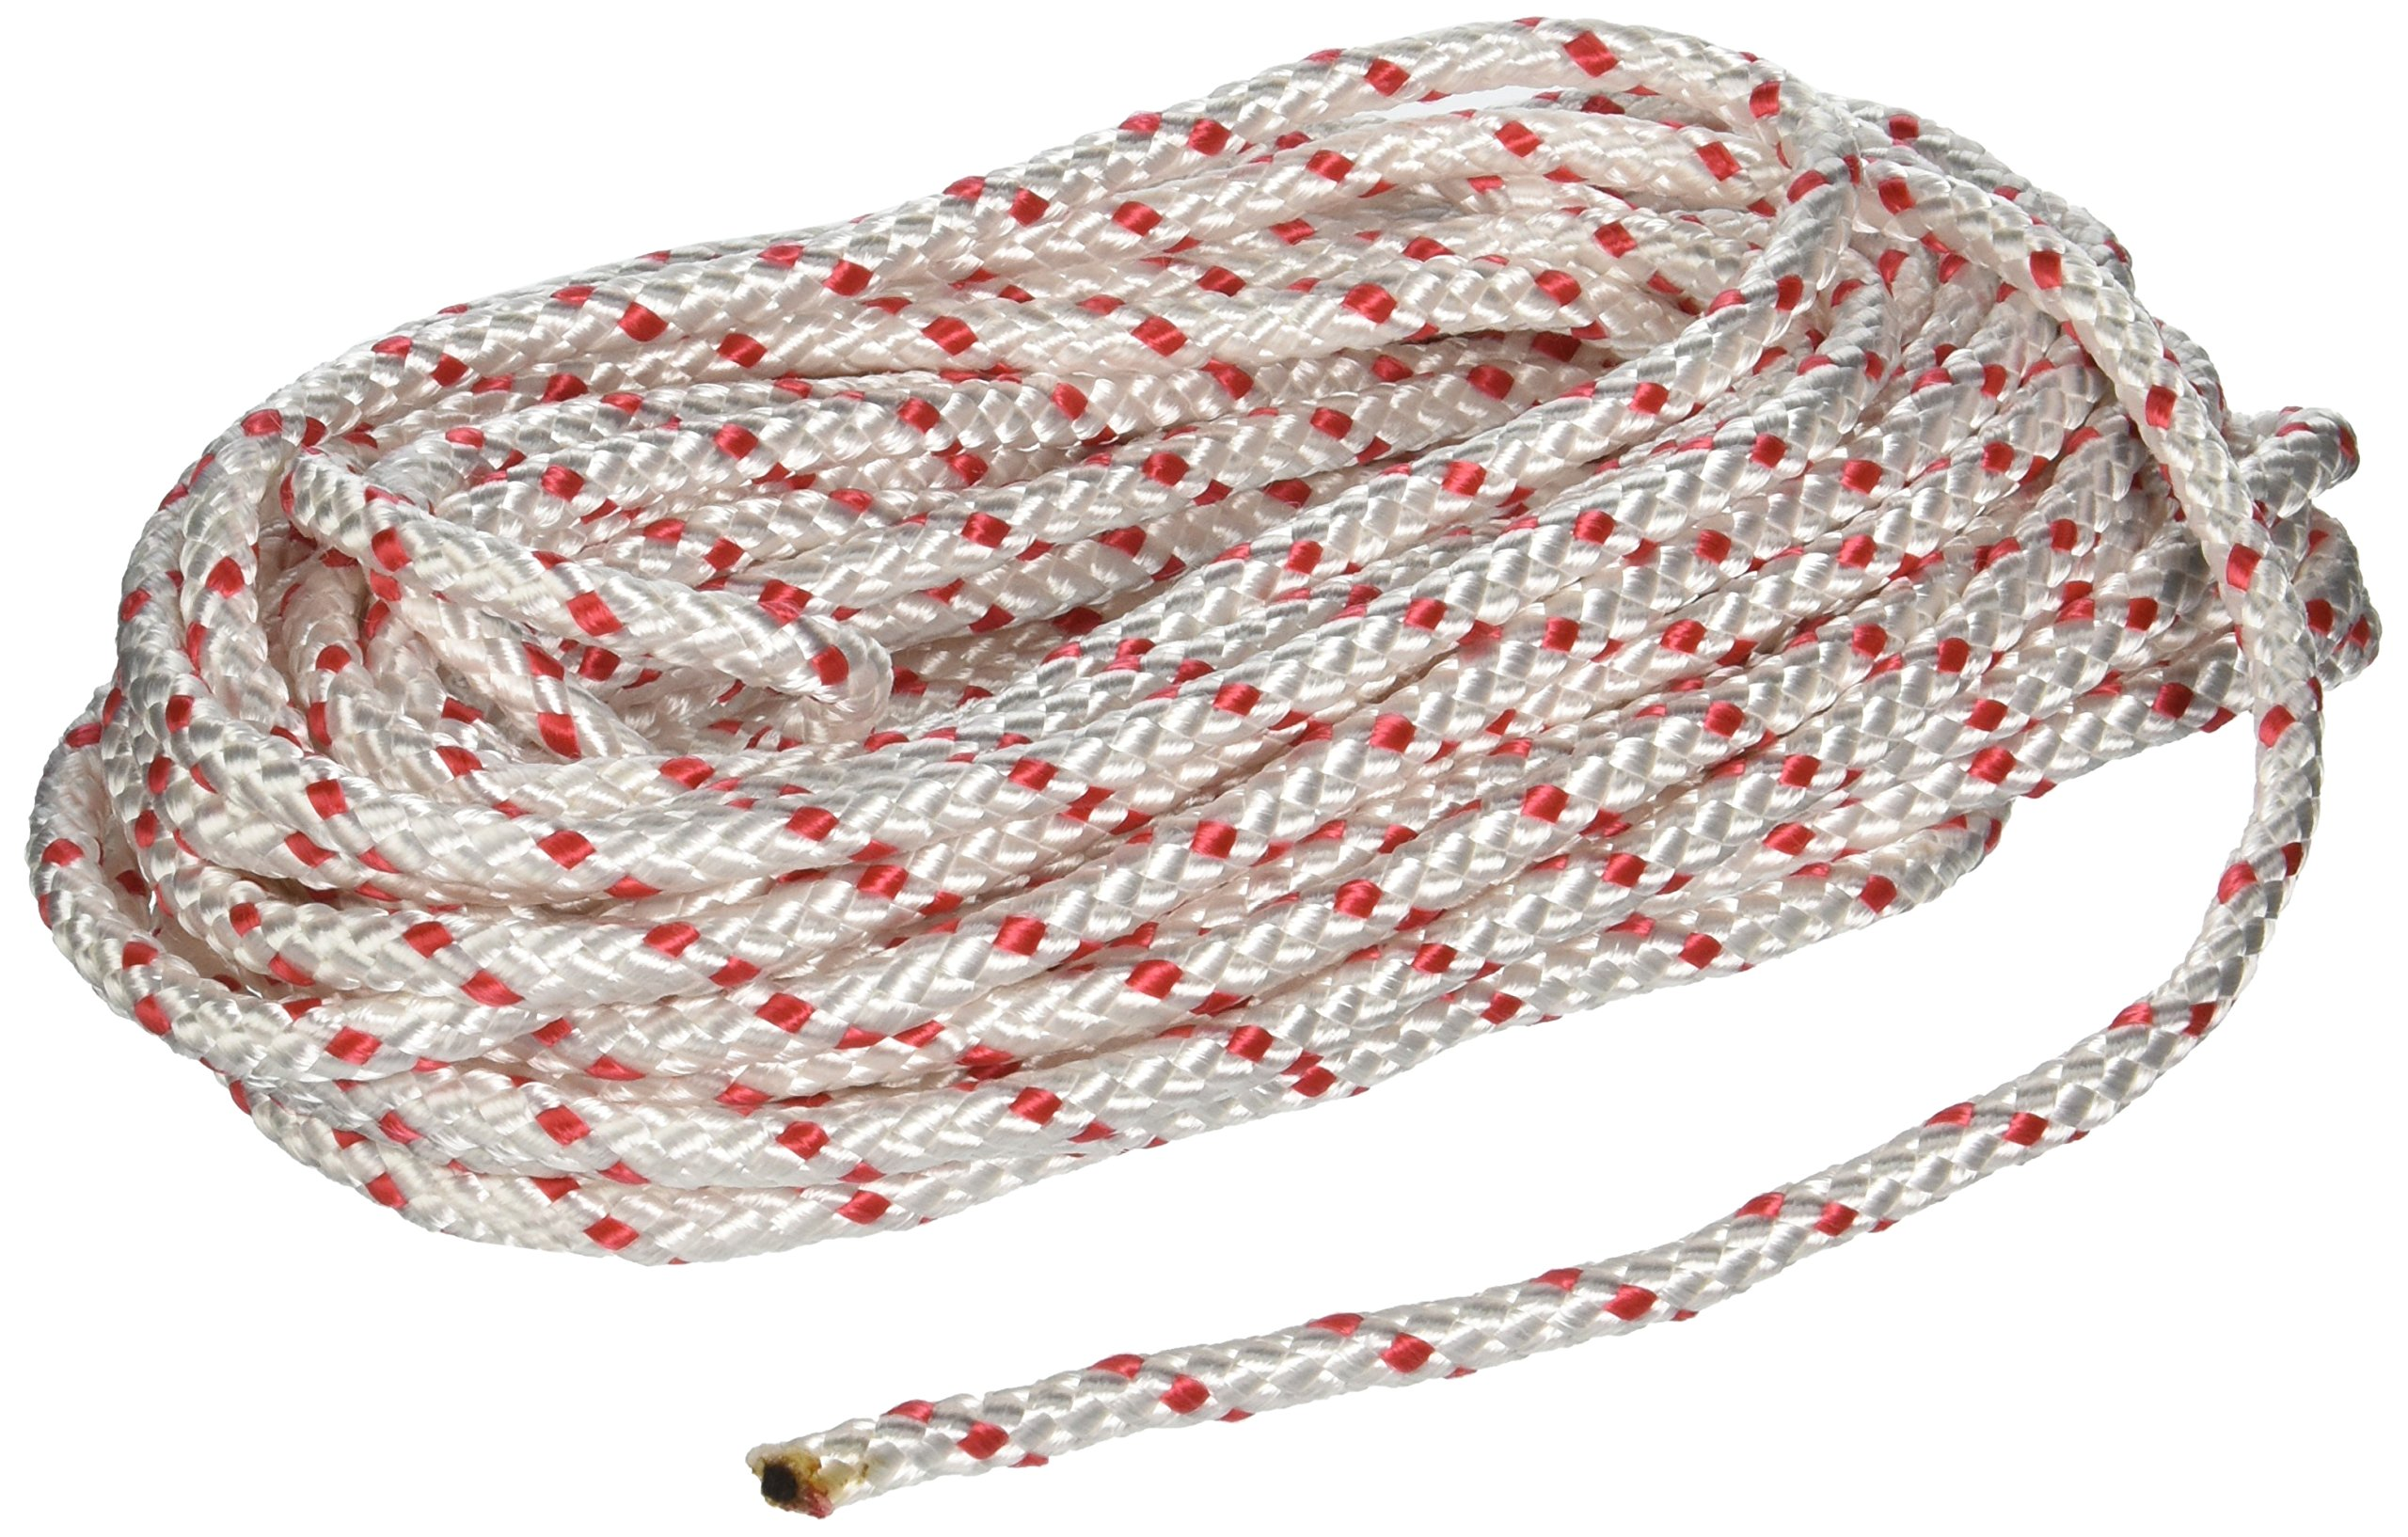 Lehigh Group BPE1050W Polypropylene Diamond Braid Rope, 50', White/Red